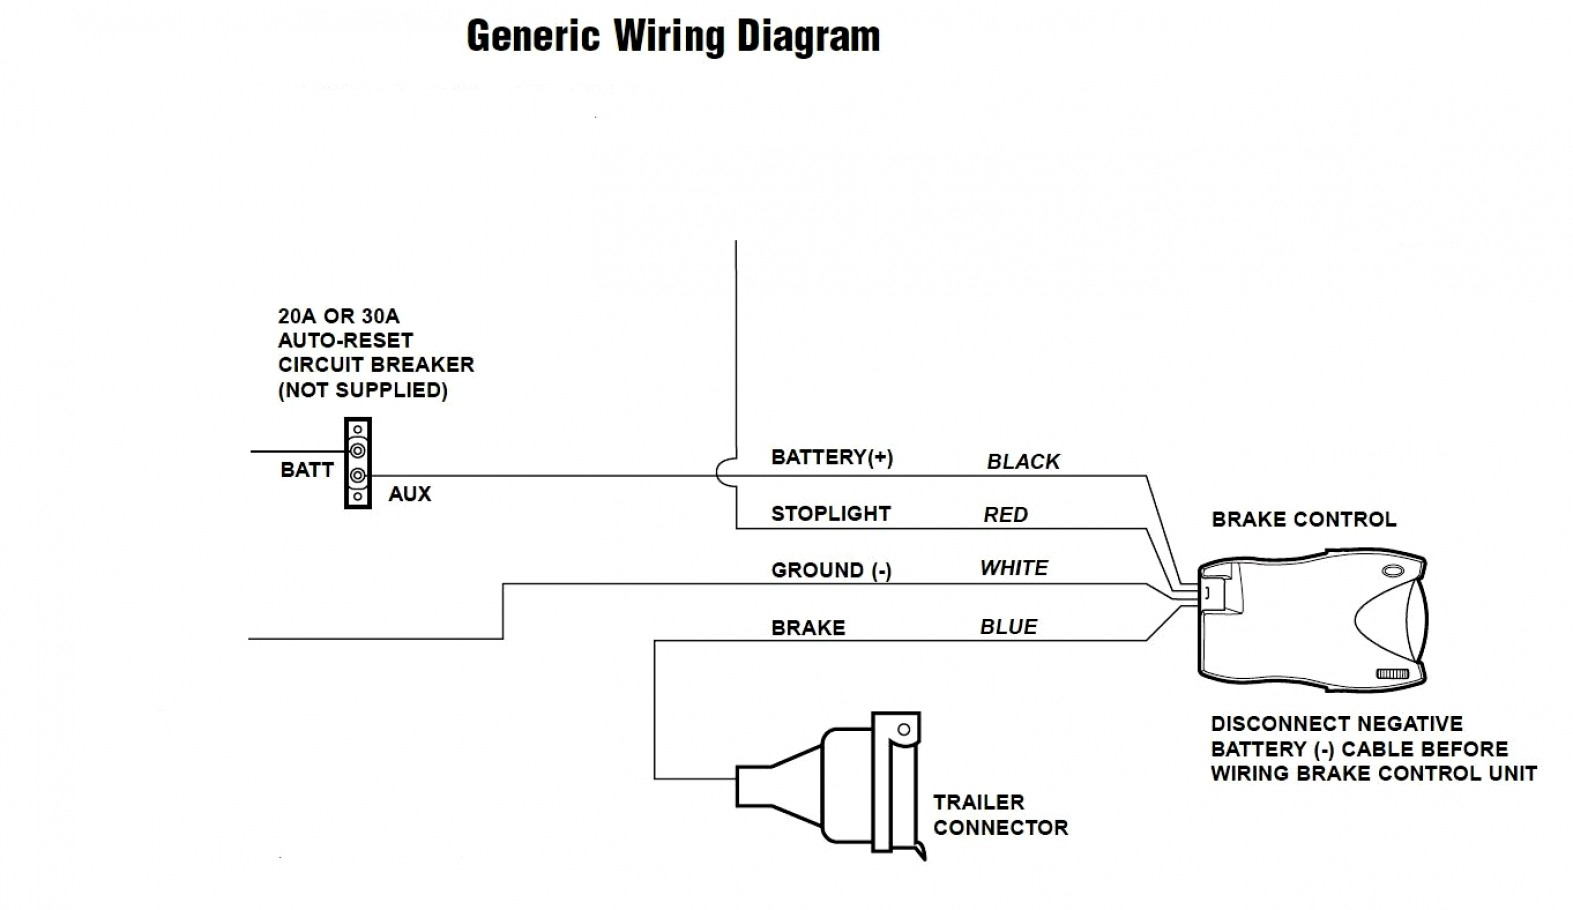 Redline Brake Controller Wiring Diagram Images Of - Brake Controller Wiring Diagram